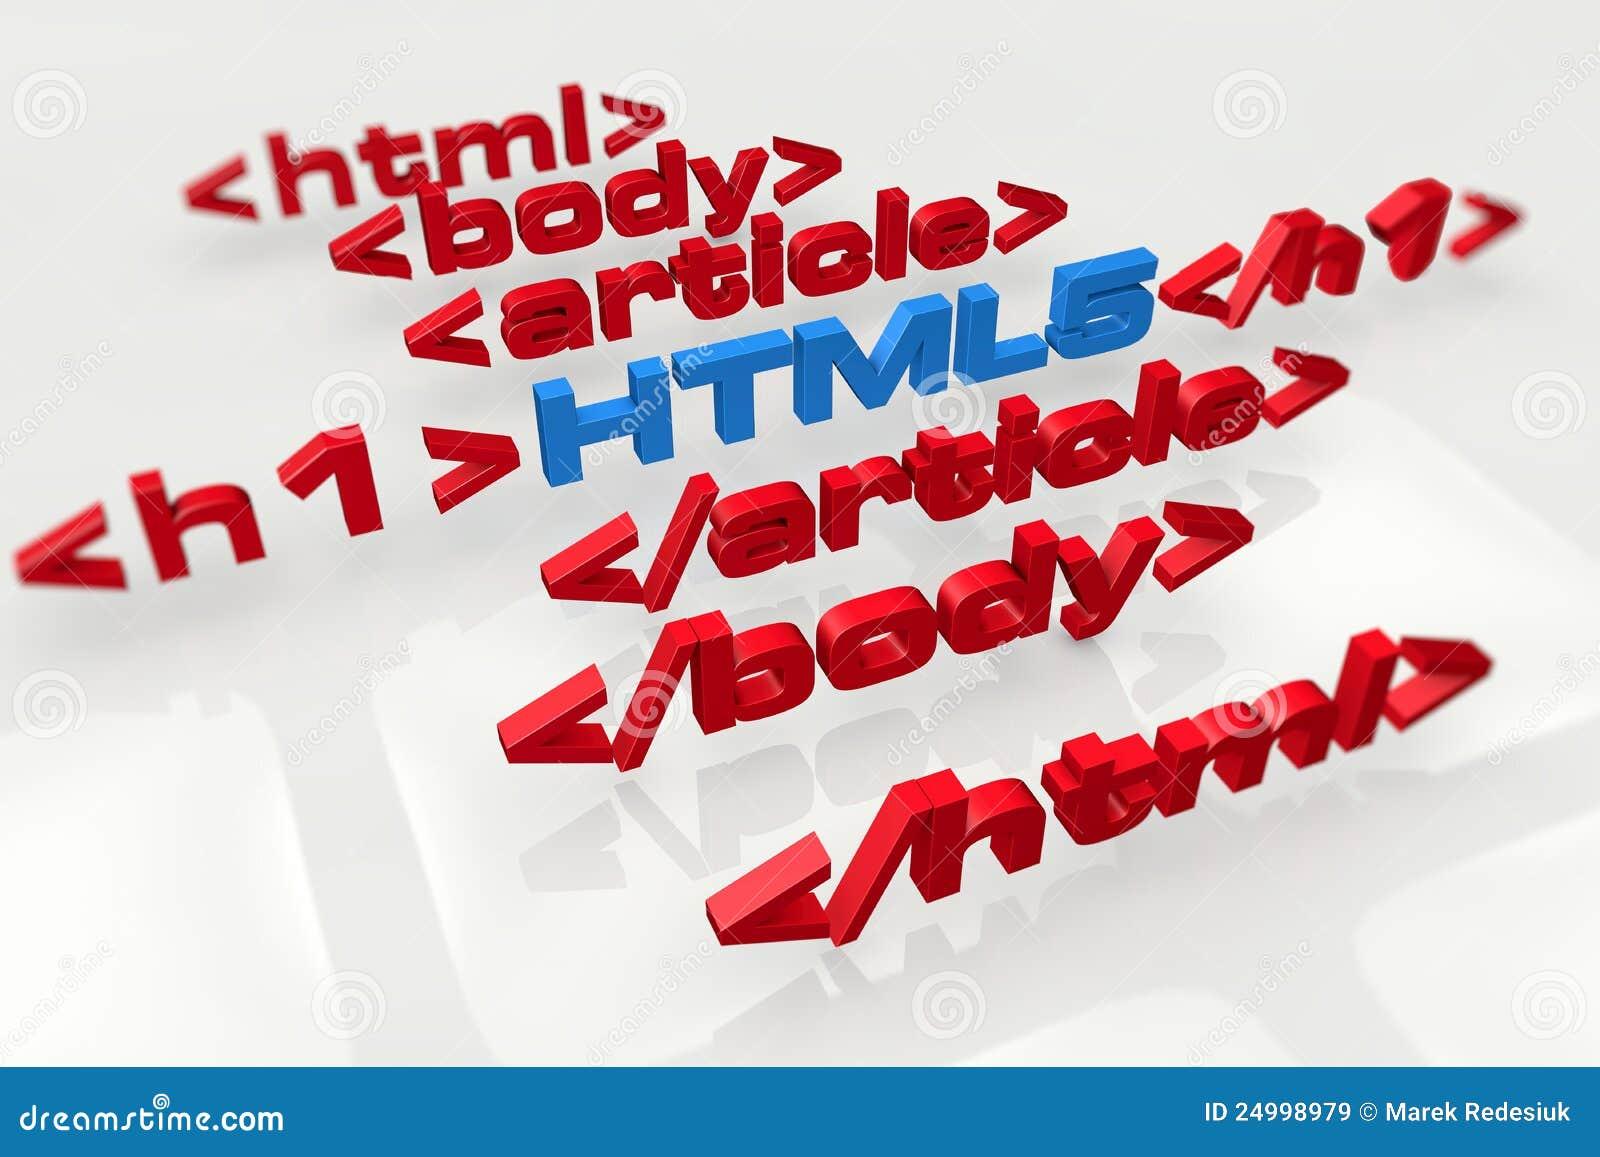 Stocks Download Shivam Creation: HTML5 Stock Illustration. Illustration Of Isolated, Create